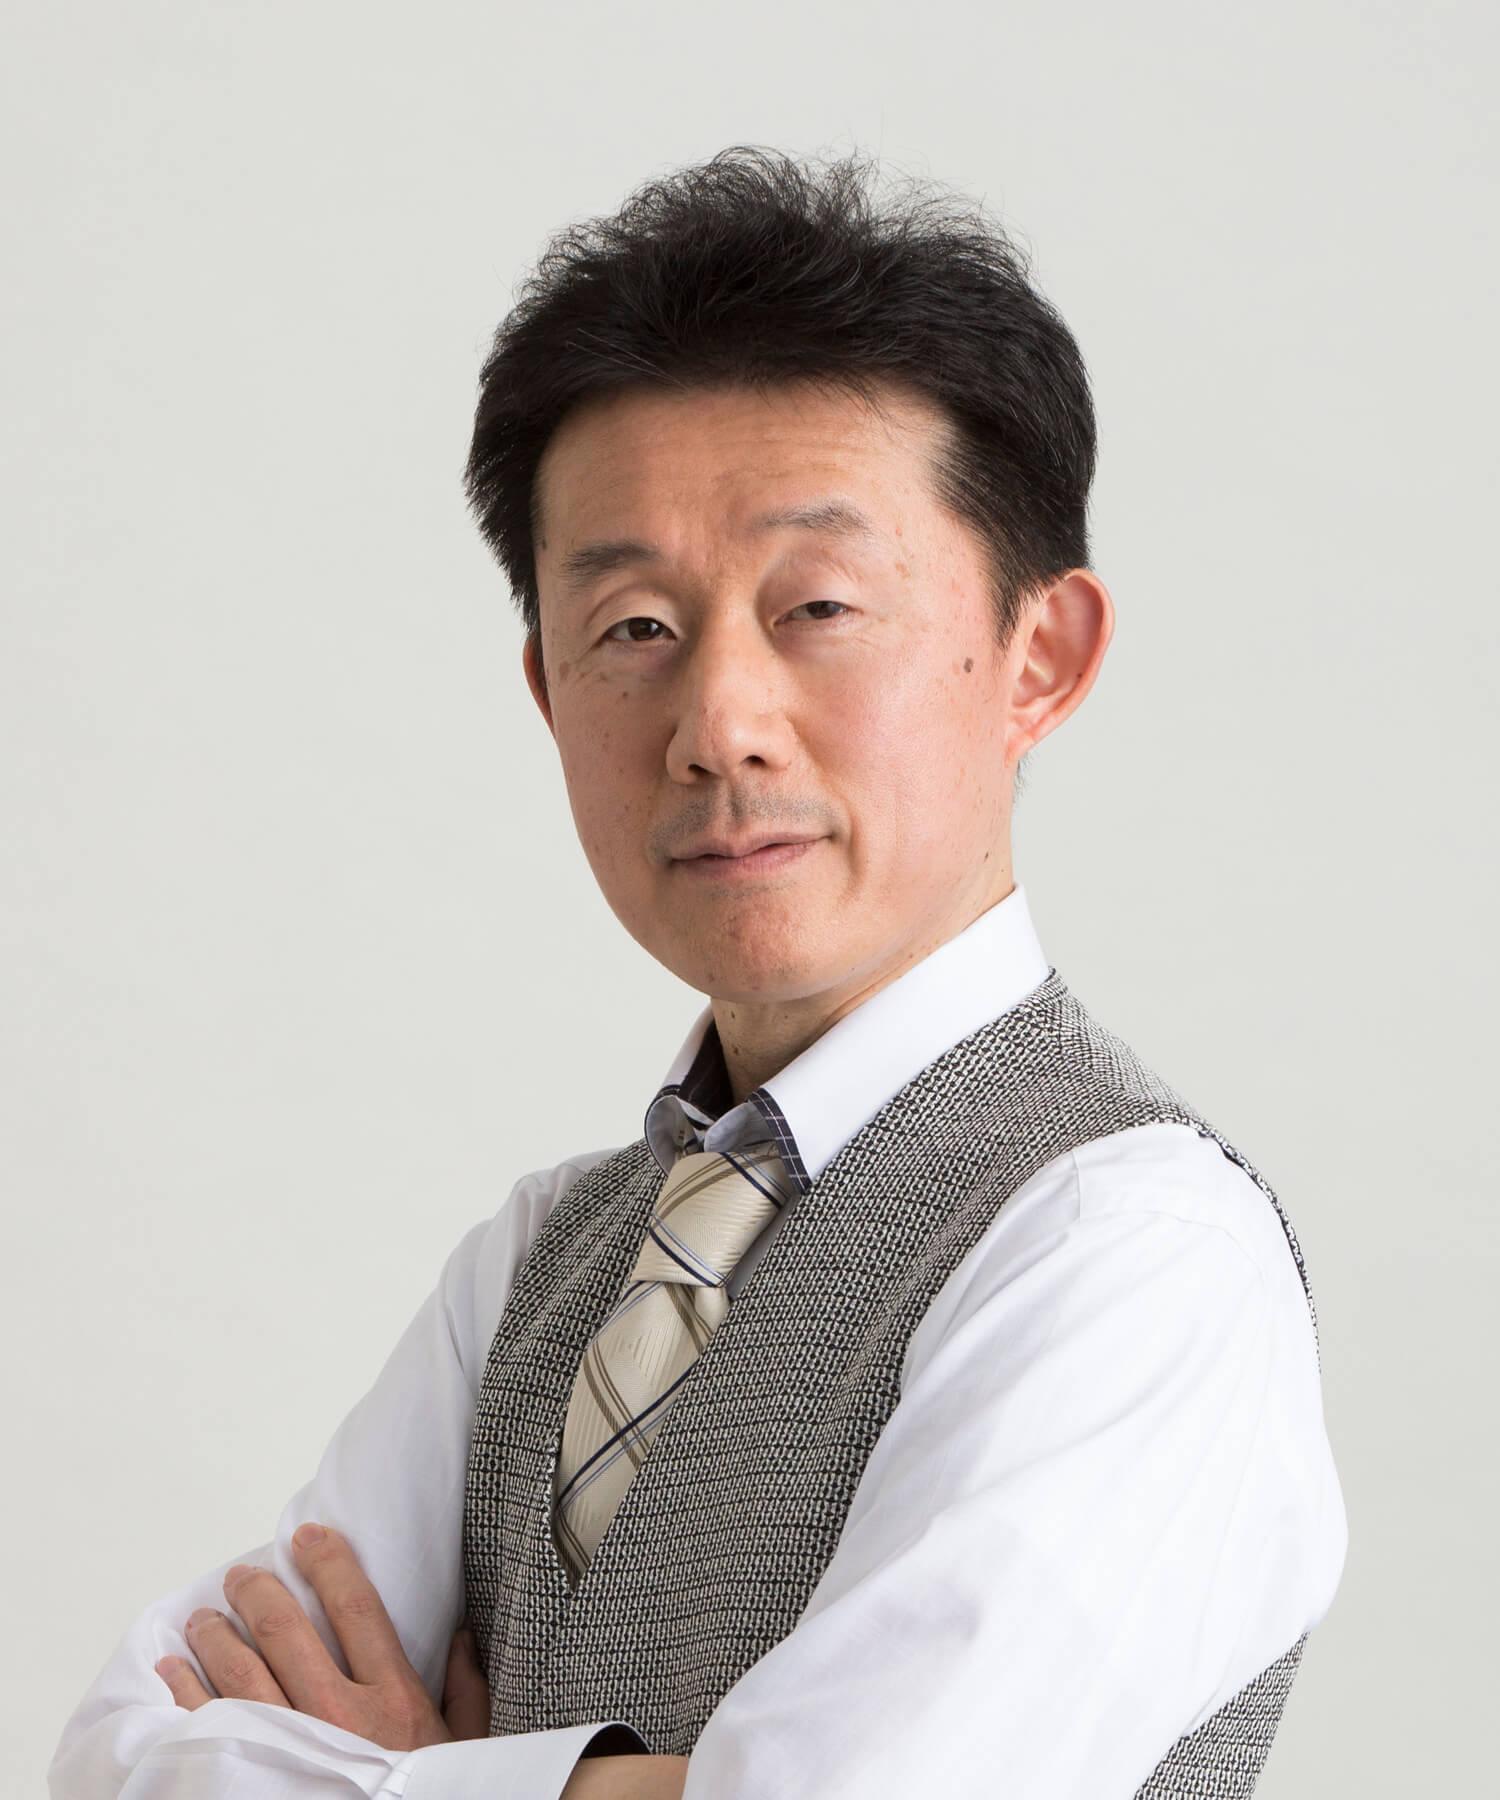 sakurada_photo